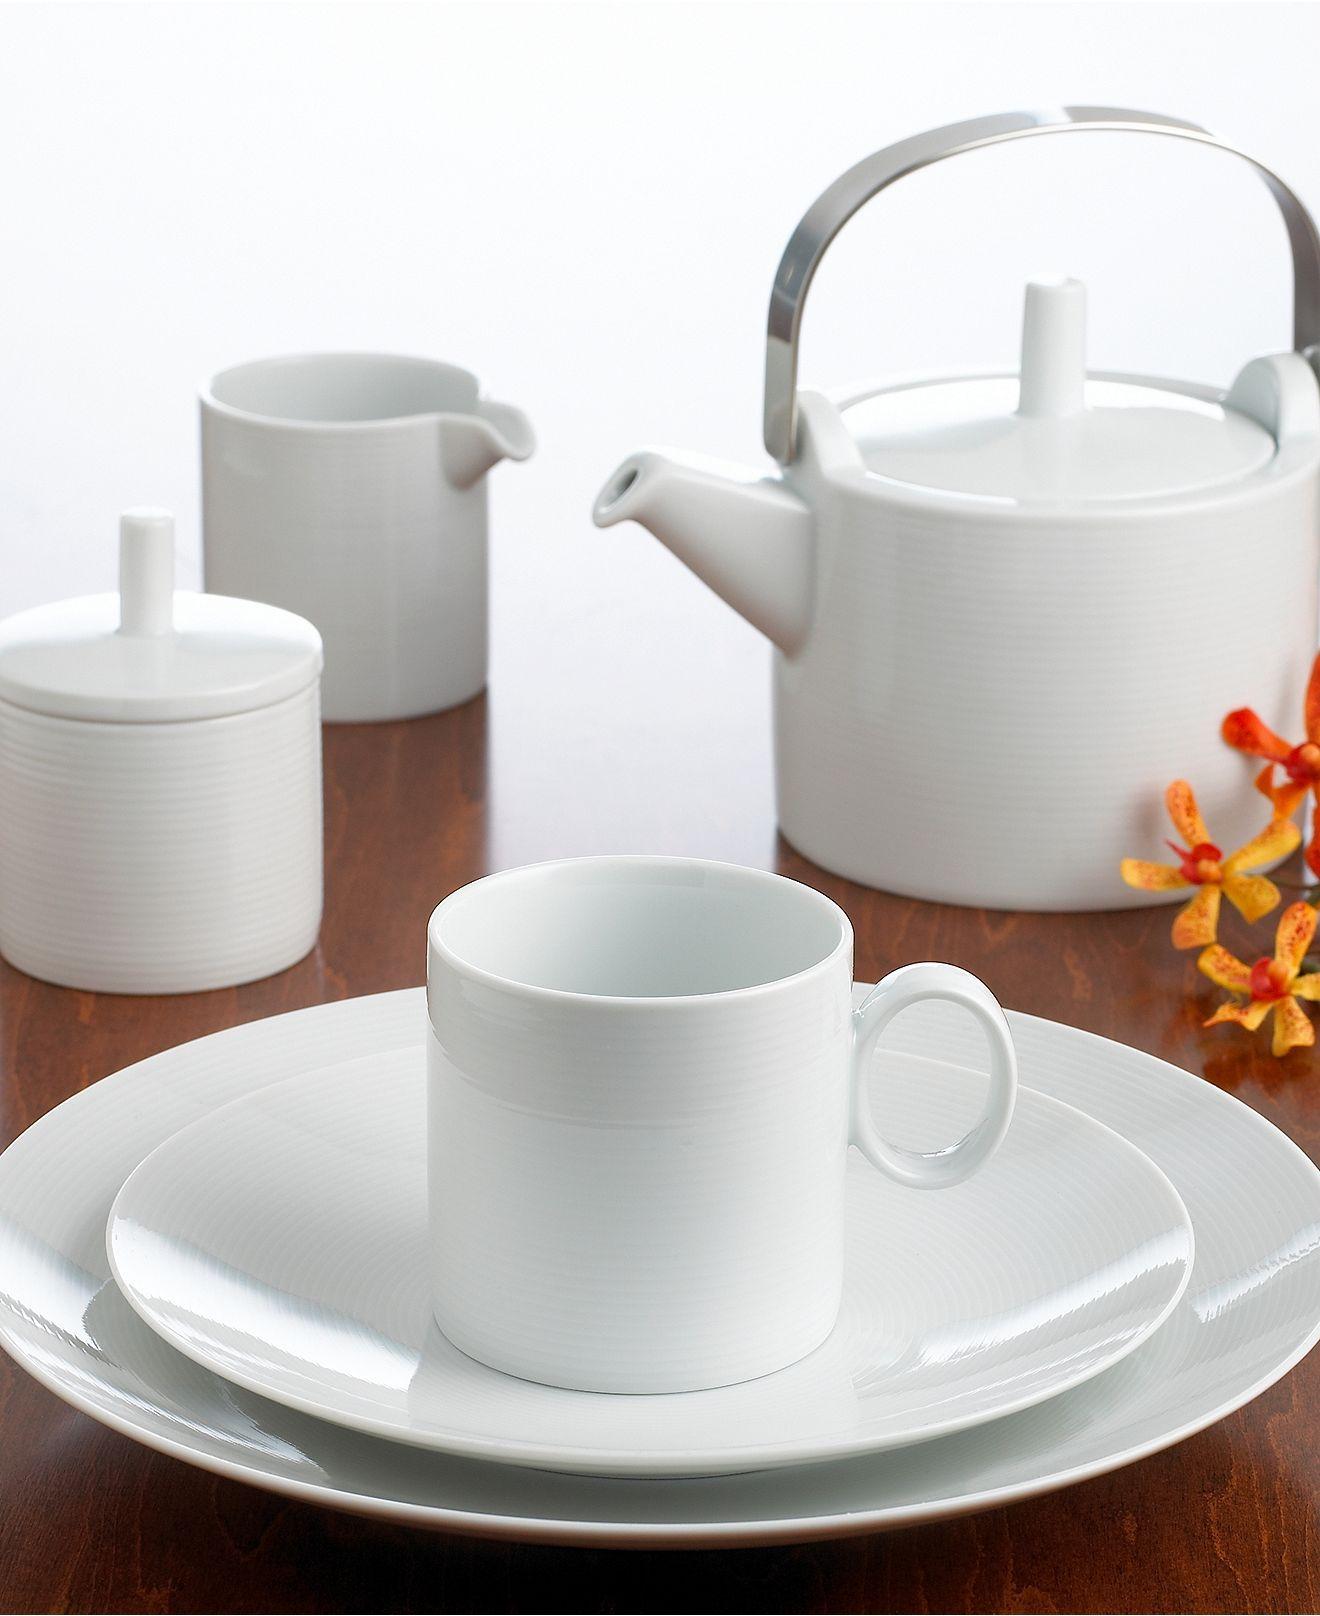 Thomas Rosenthal Loft Dinnerware Collection - Dinnerware - Dining u0026 Entertaining - Macyu0027s & Thomas Rosenthal Loft Dinnerware Collection | Dinnerware Casual ...